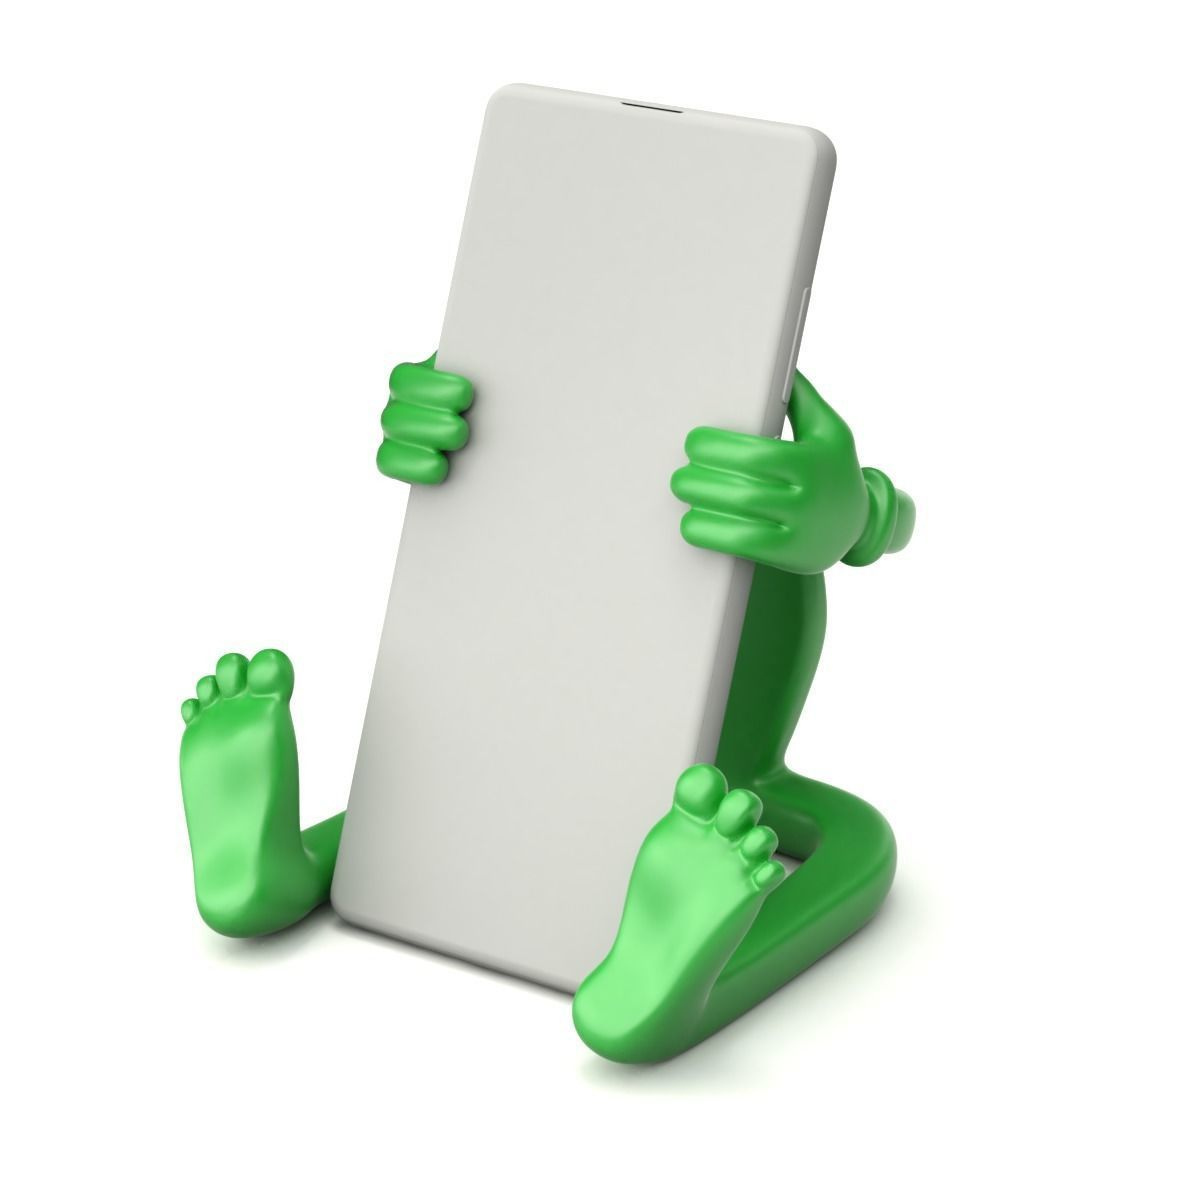 Cartoonish Mobile Holder